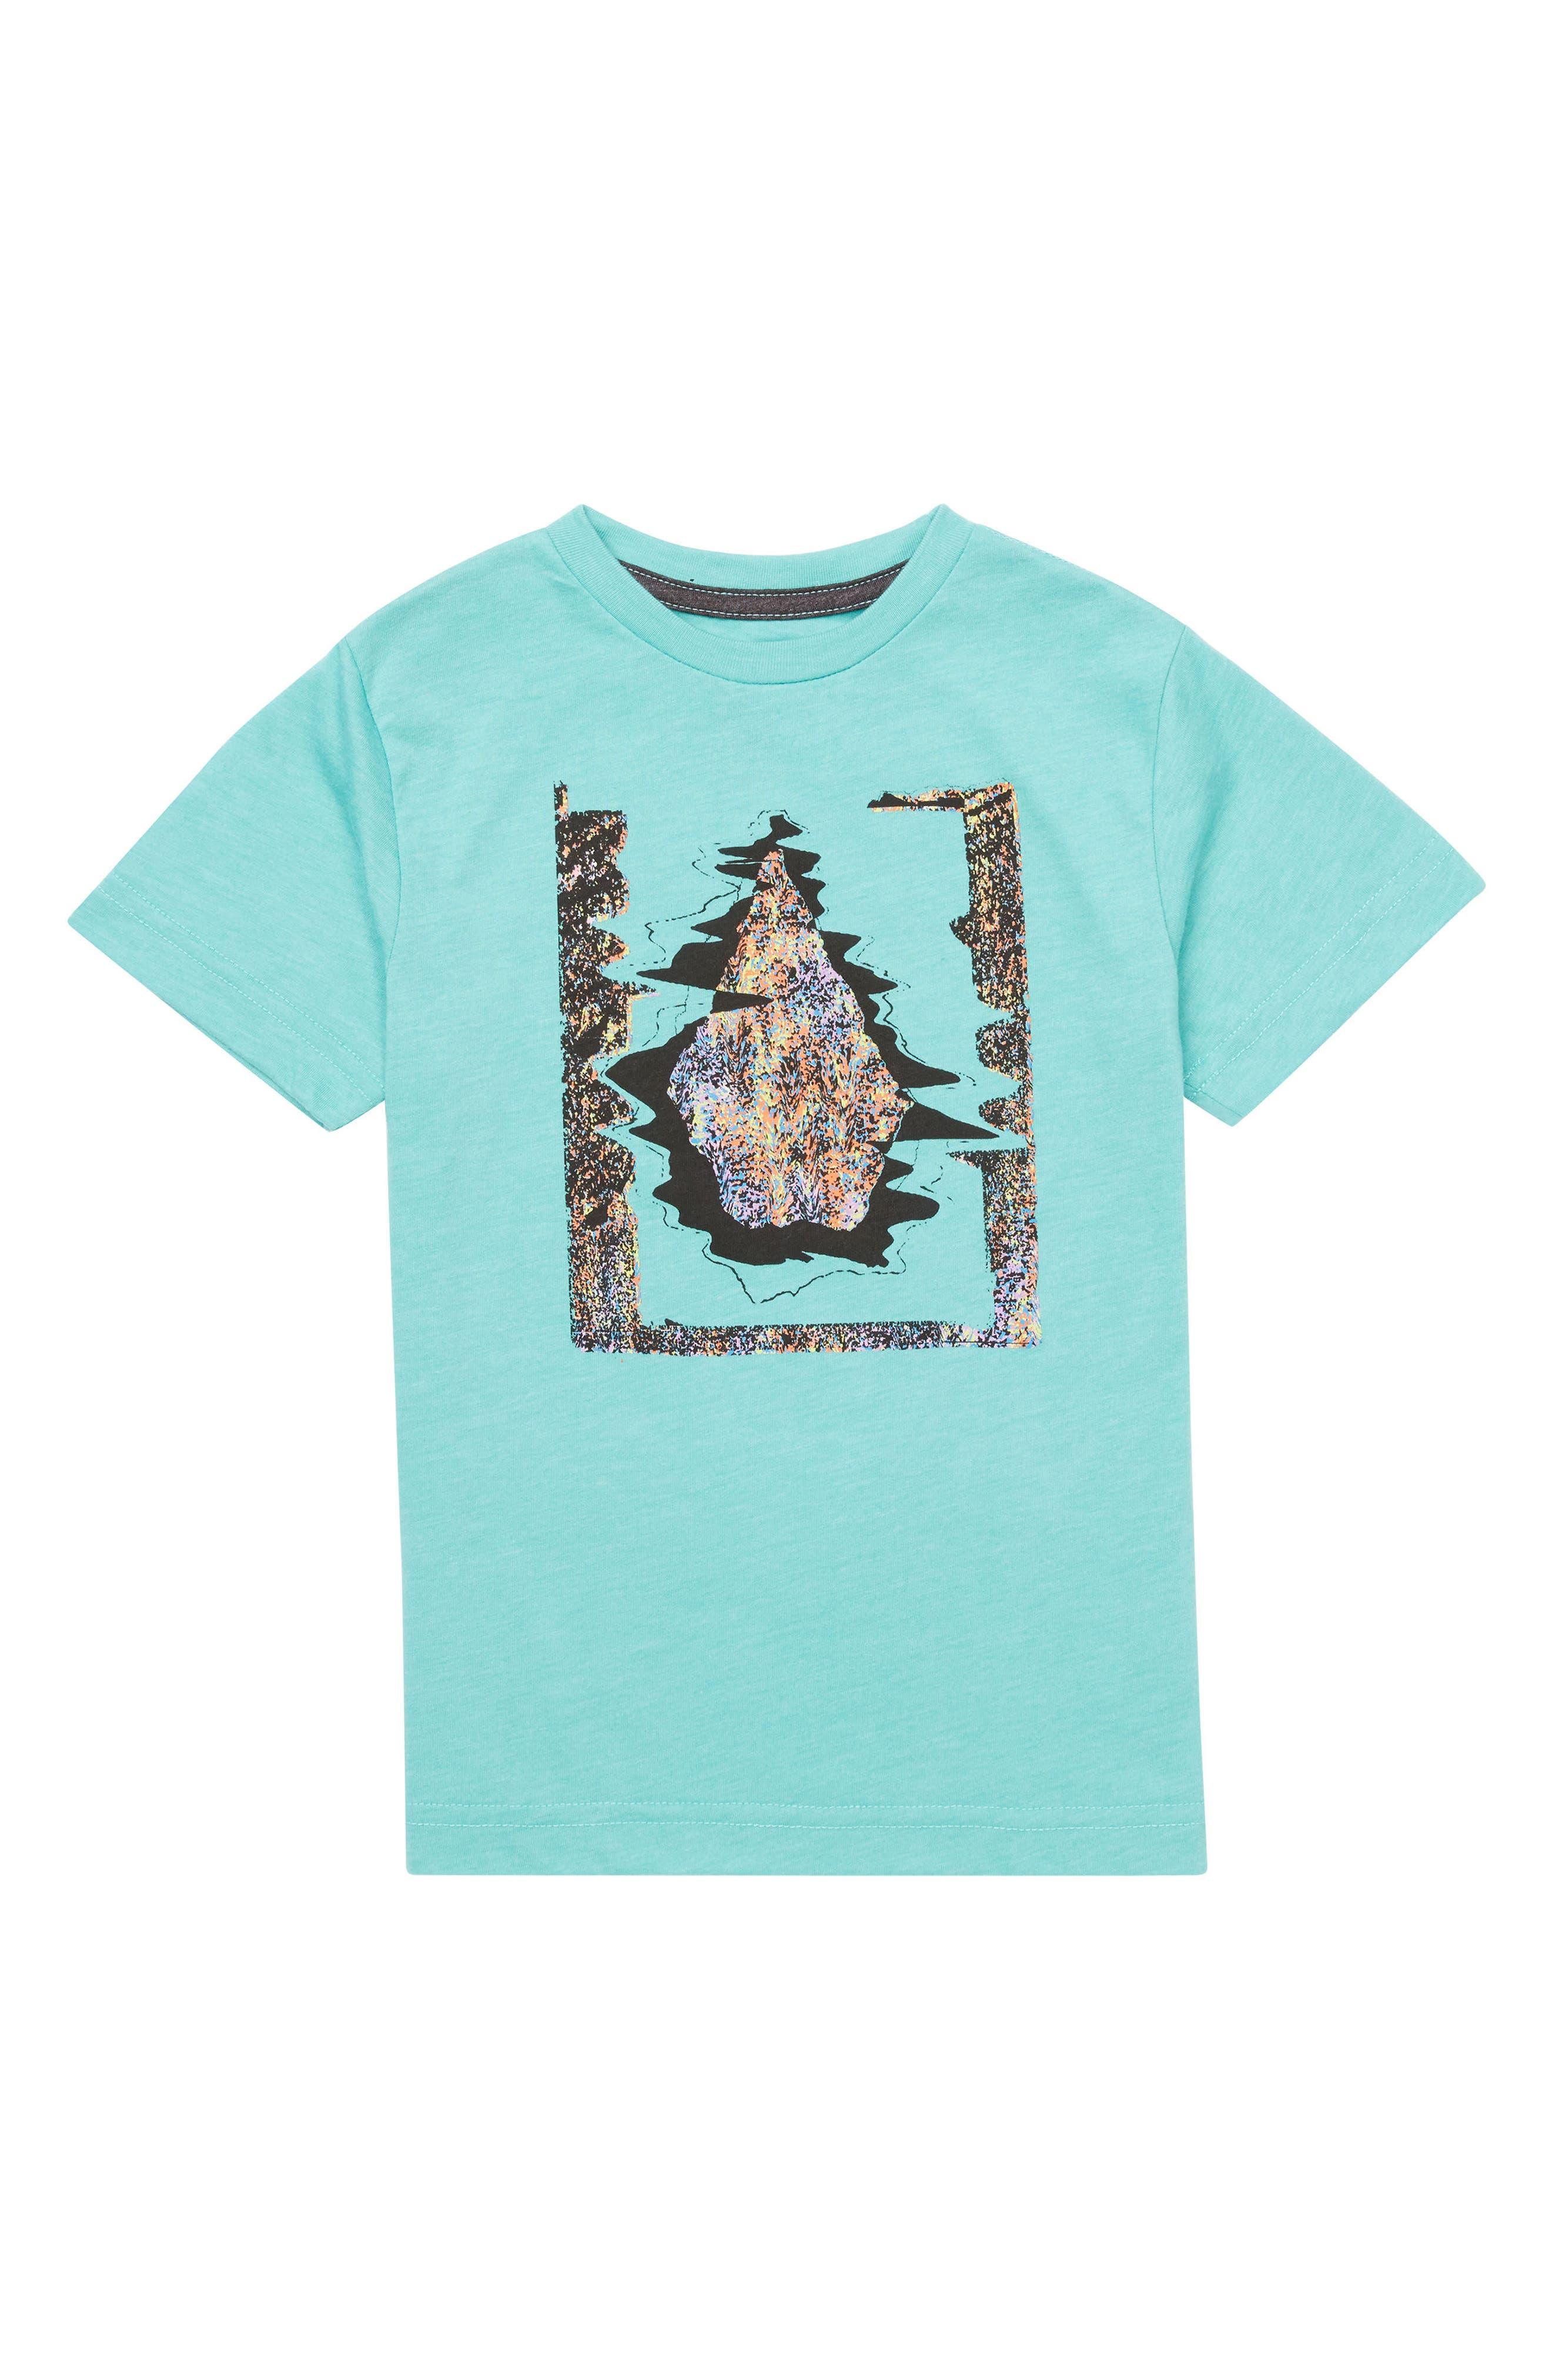 Statiq Graphic T-Shirt,                             Main thumbnail 1, color,                             440